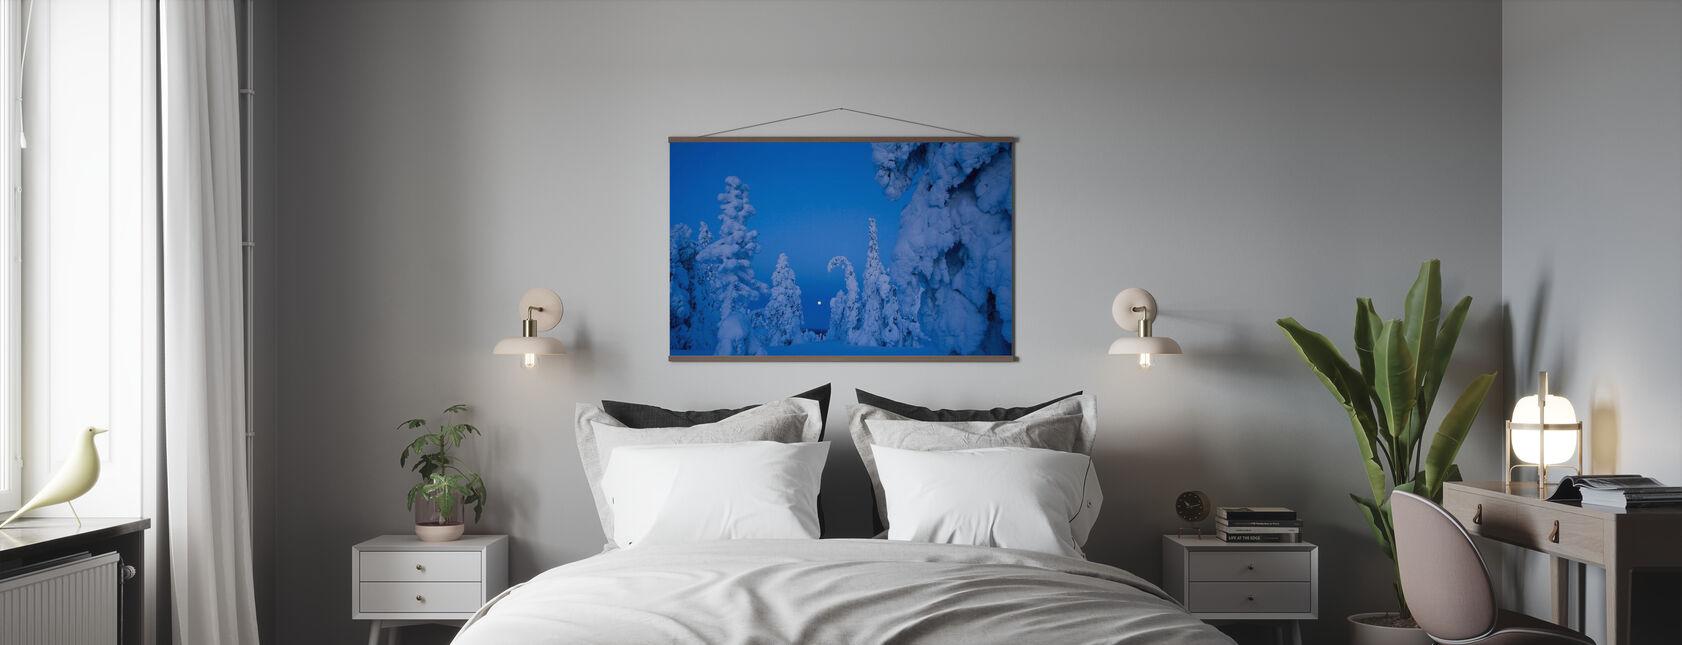 Sneeuw beladen Taiga Bos - Poster - Slaapkamer